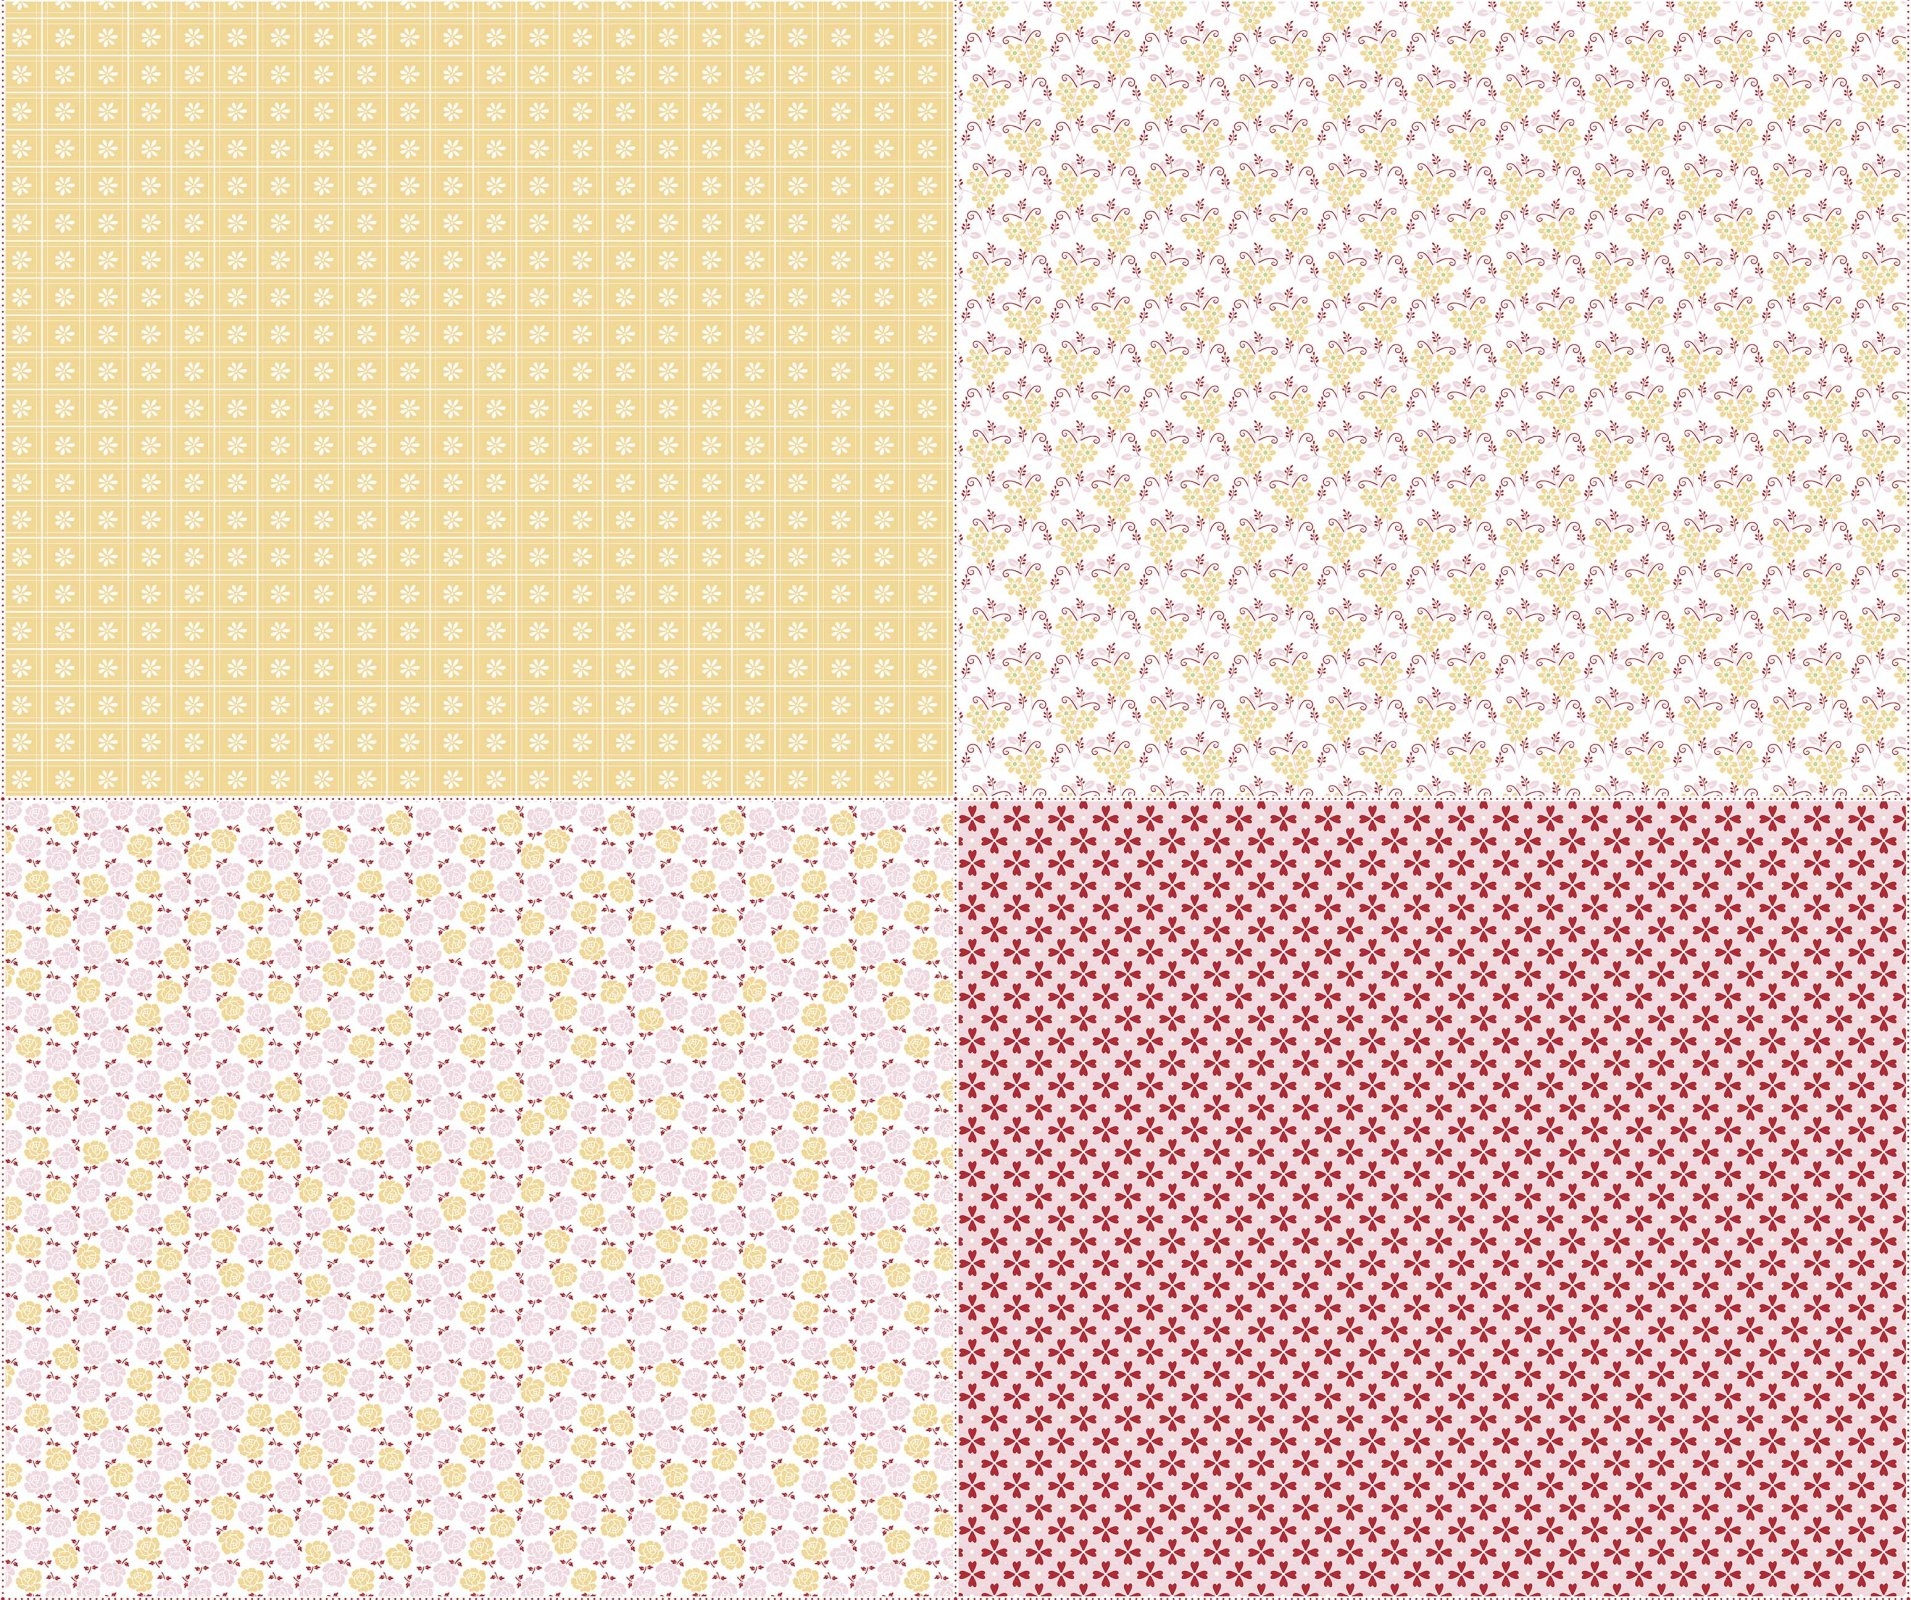 Sew Cherry 2 FQ Panel FQP5809 Yellow